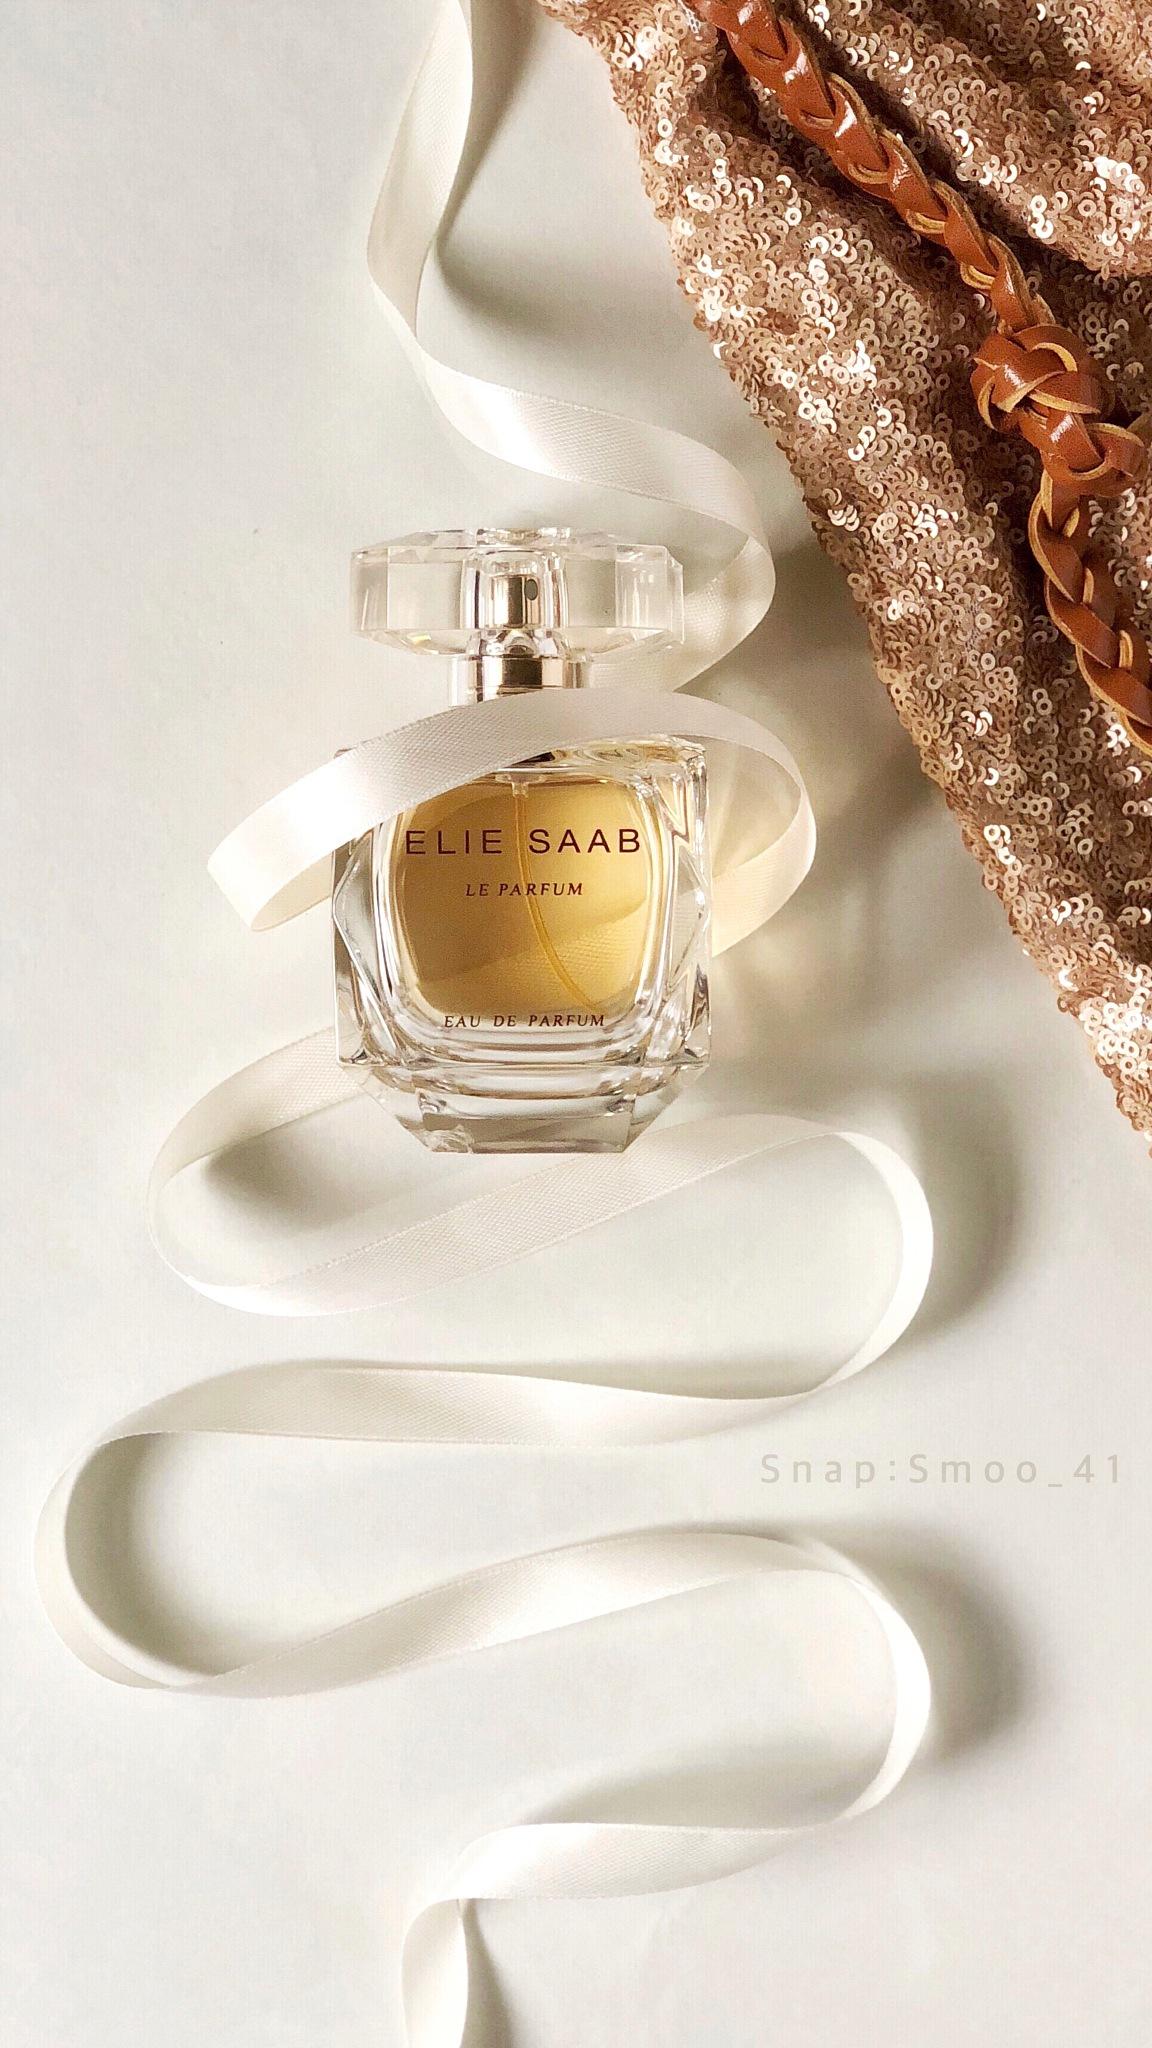 Perfume Elie Saab by smoo_41